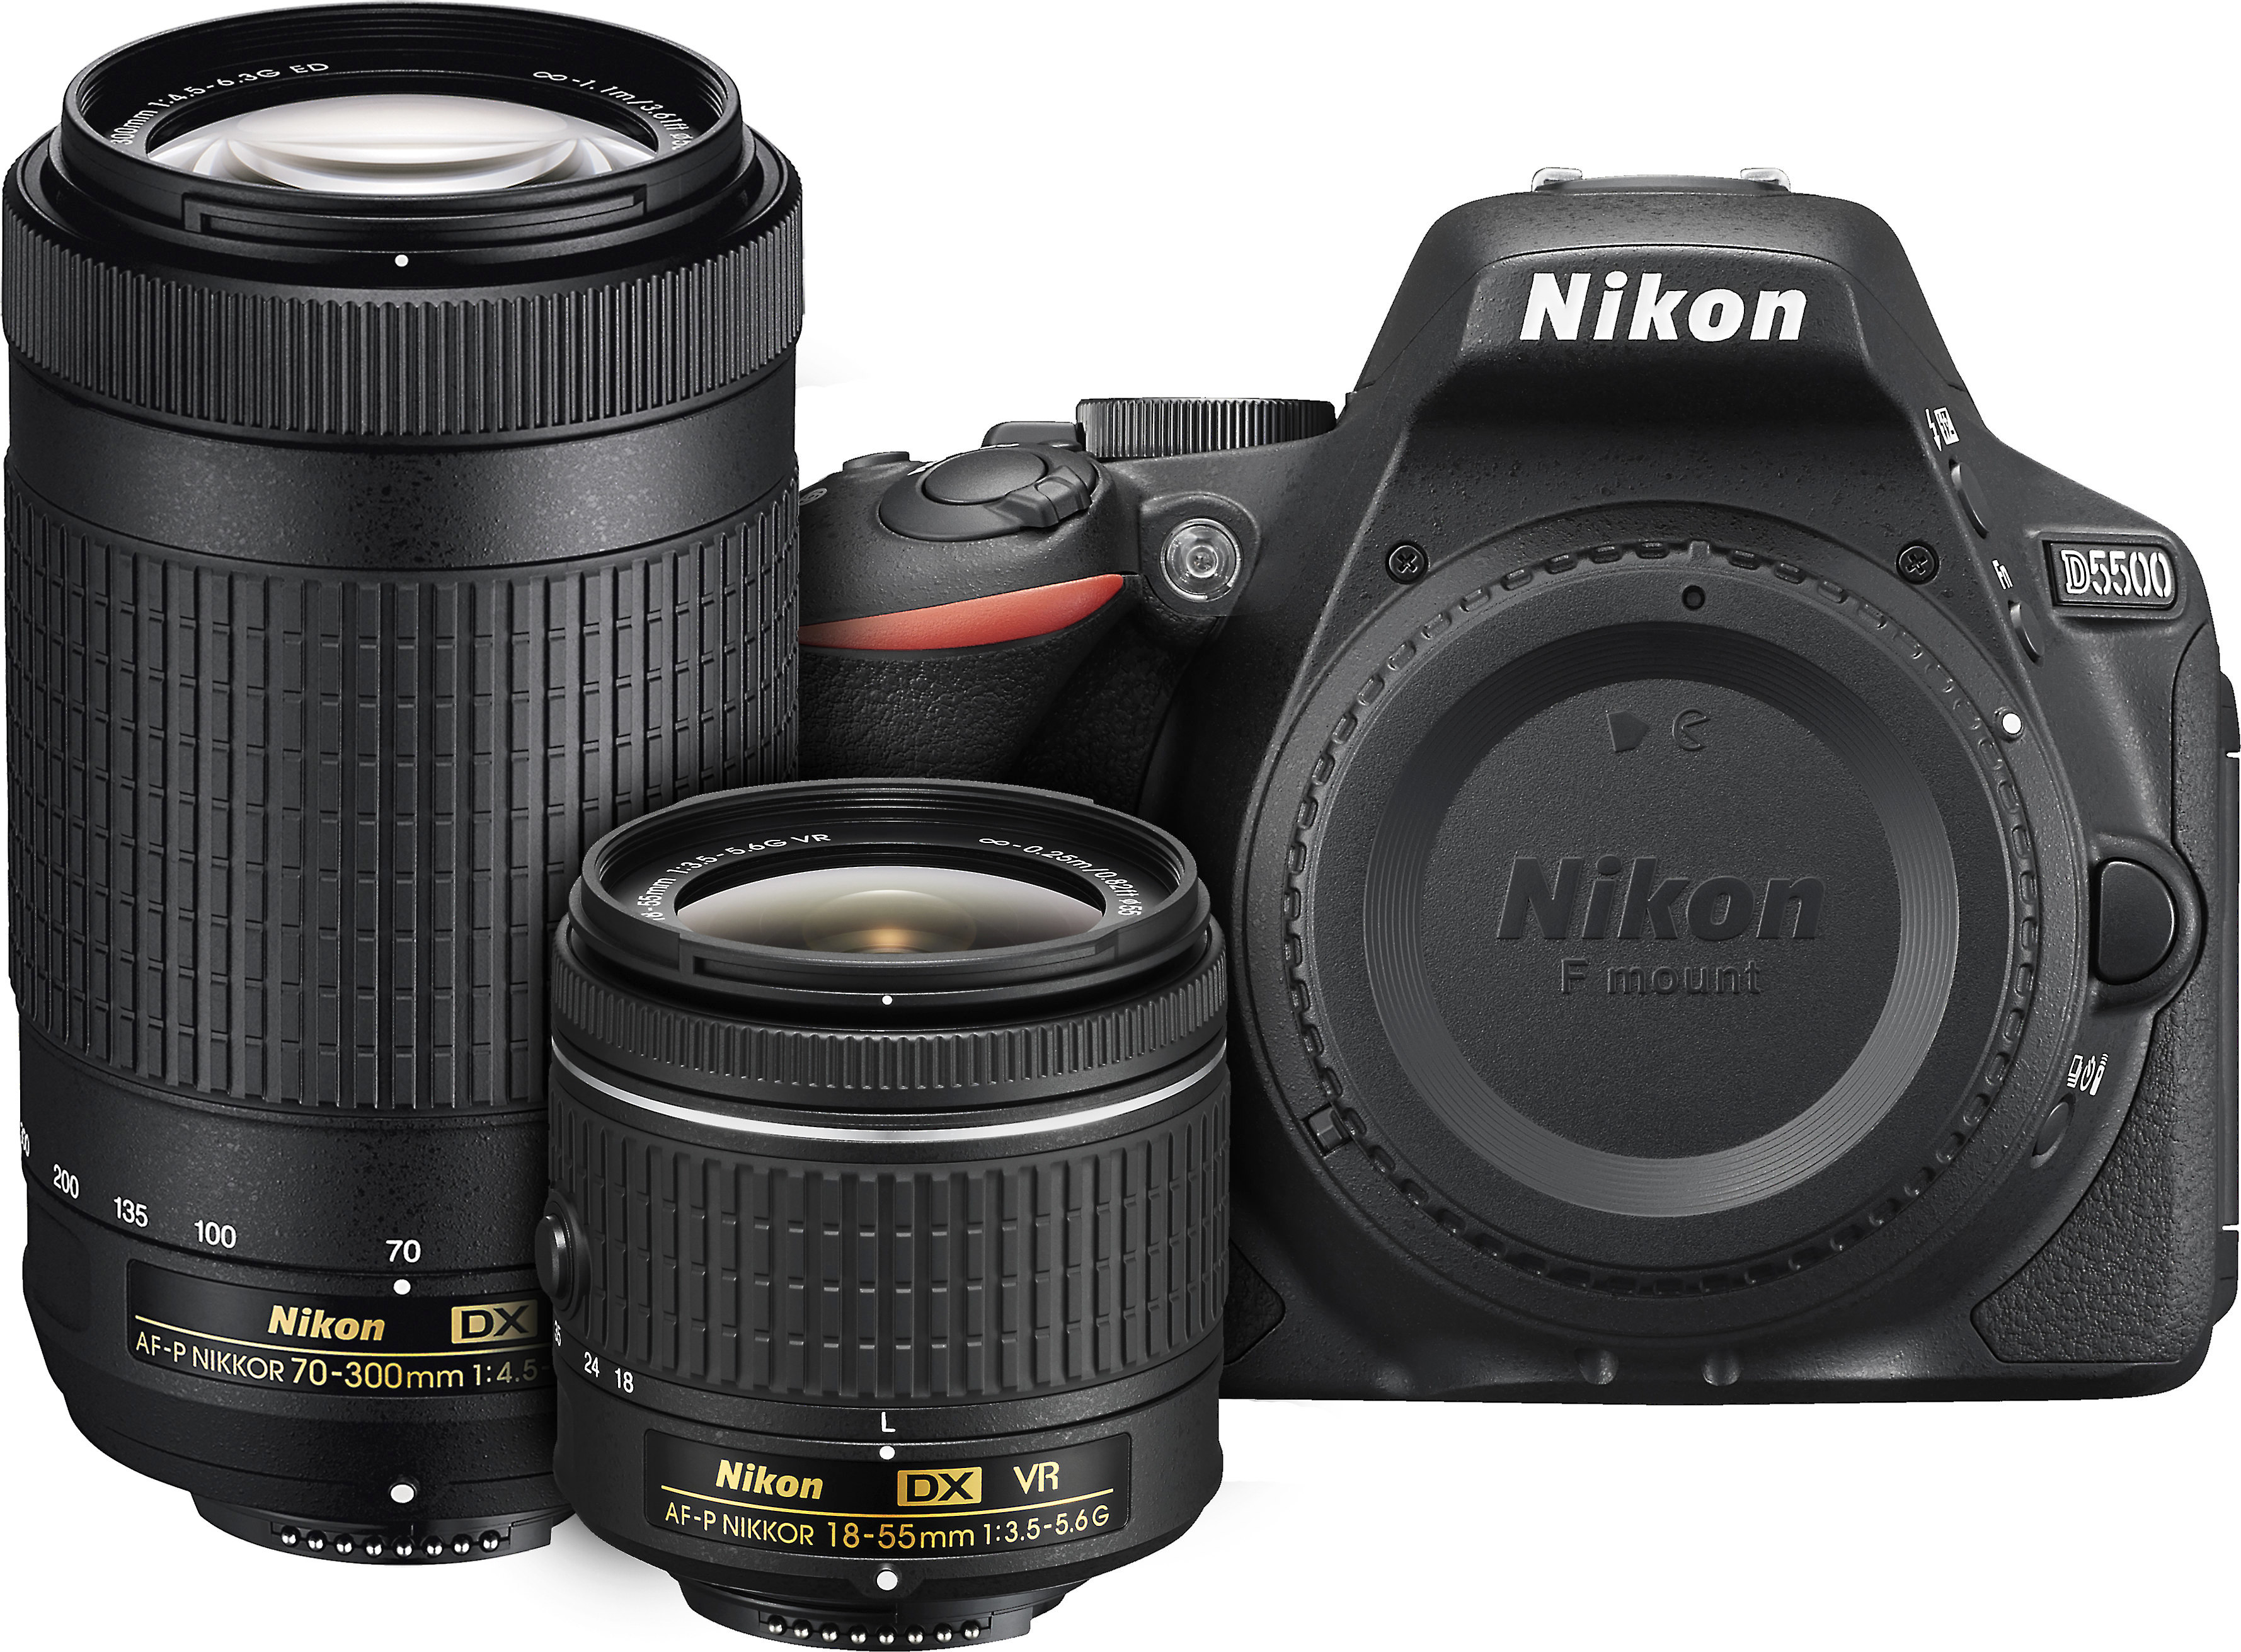 Nikon D5500 LCD Display Screen Video Picture Visual